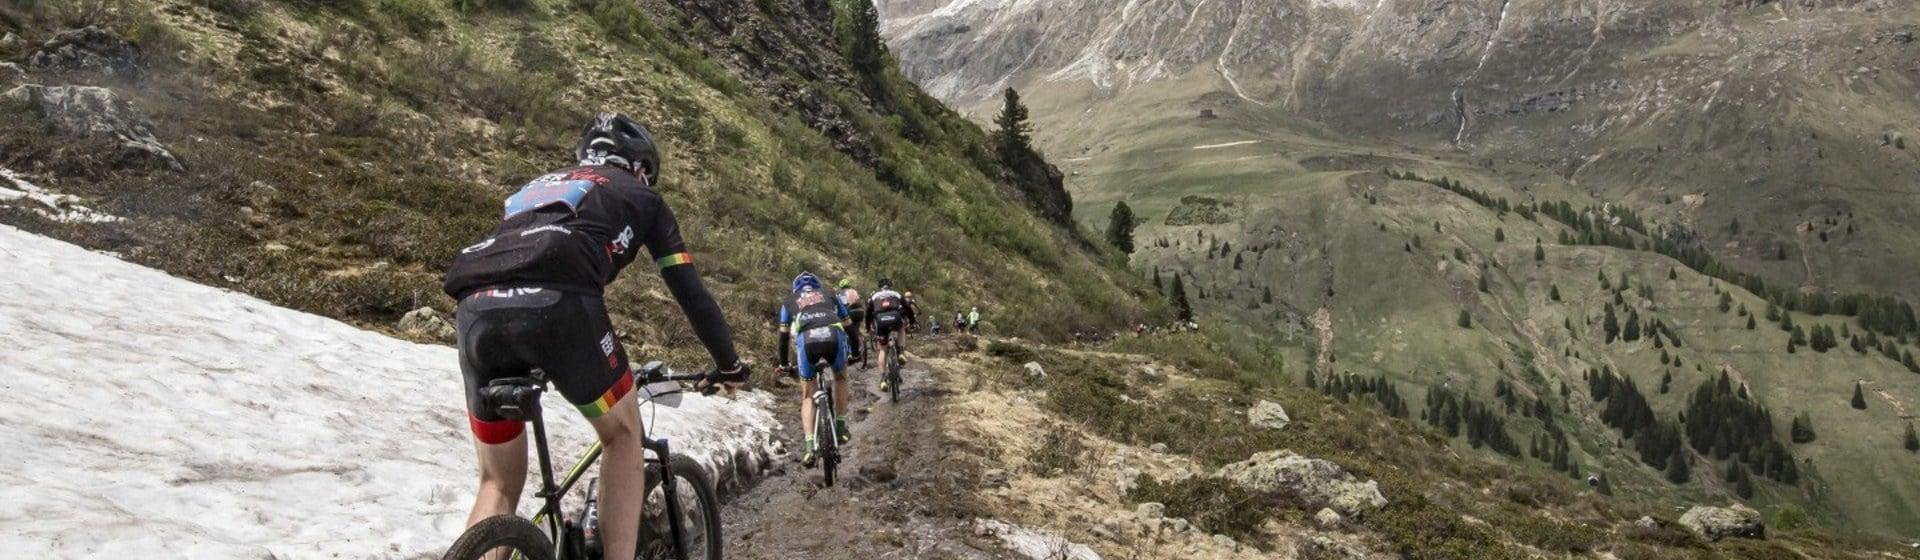 12.06.21 Passaggio HERO Dolomites